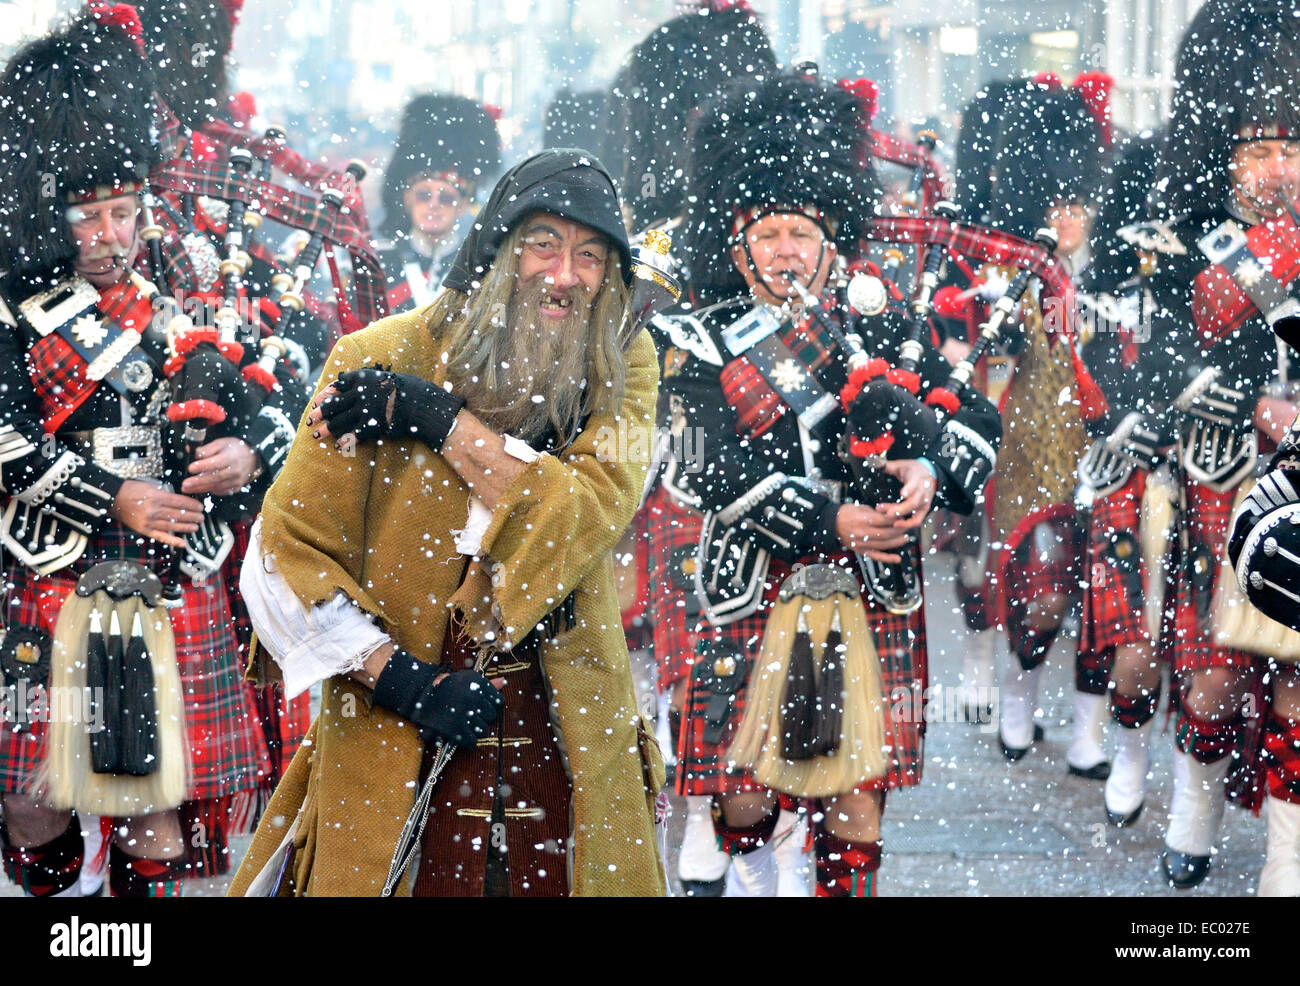 rochester kent uk 06th dec 2014 dickensian christmas festival parade - Dickens Christmas Festival